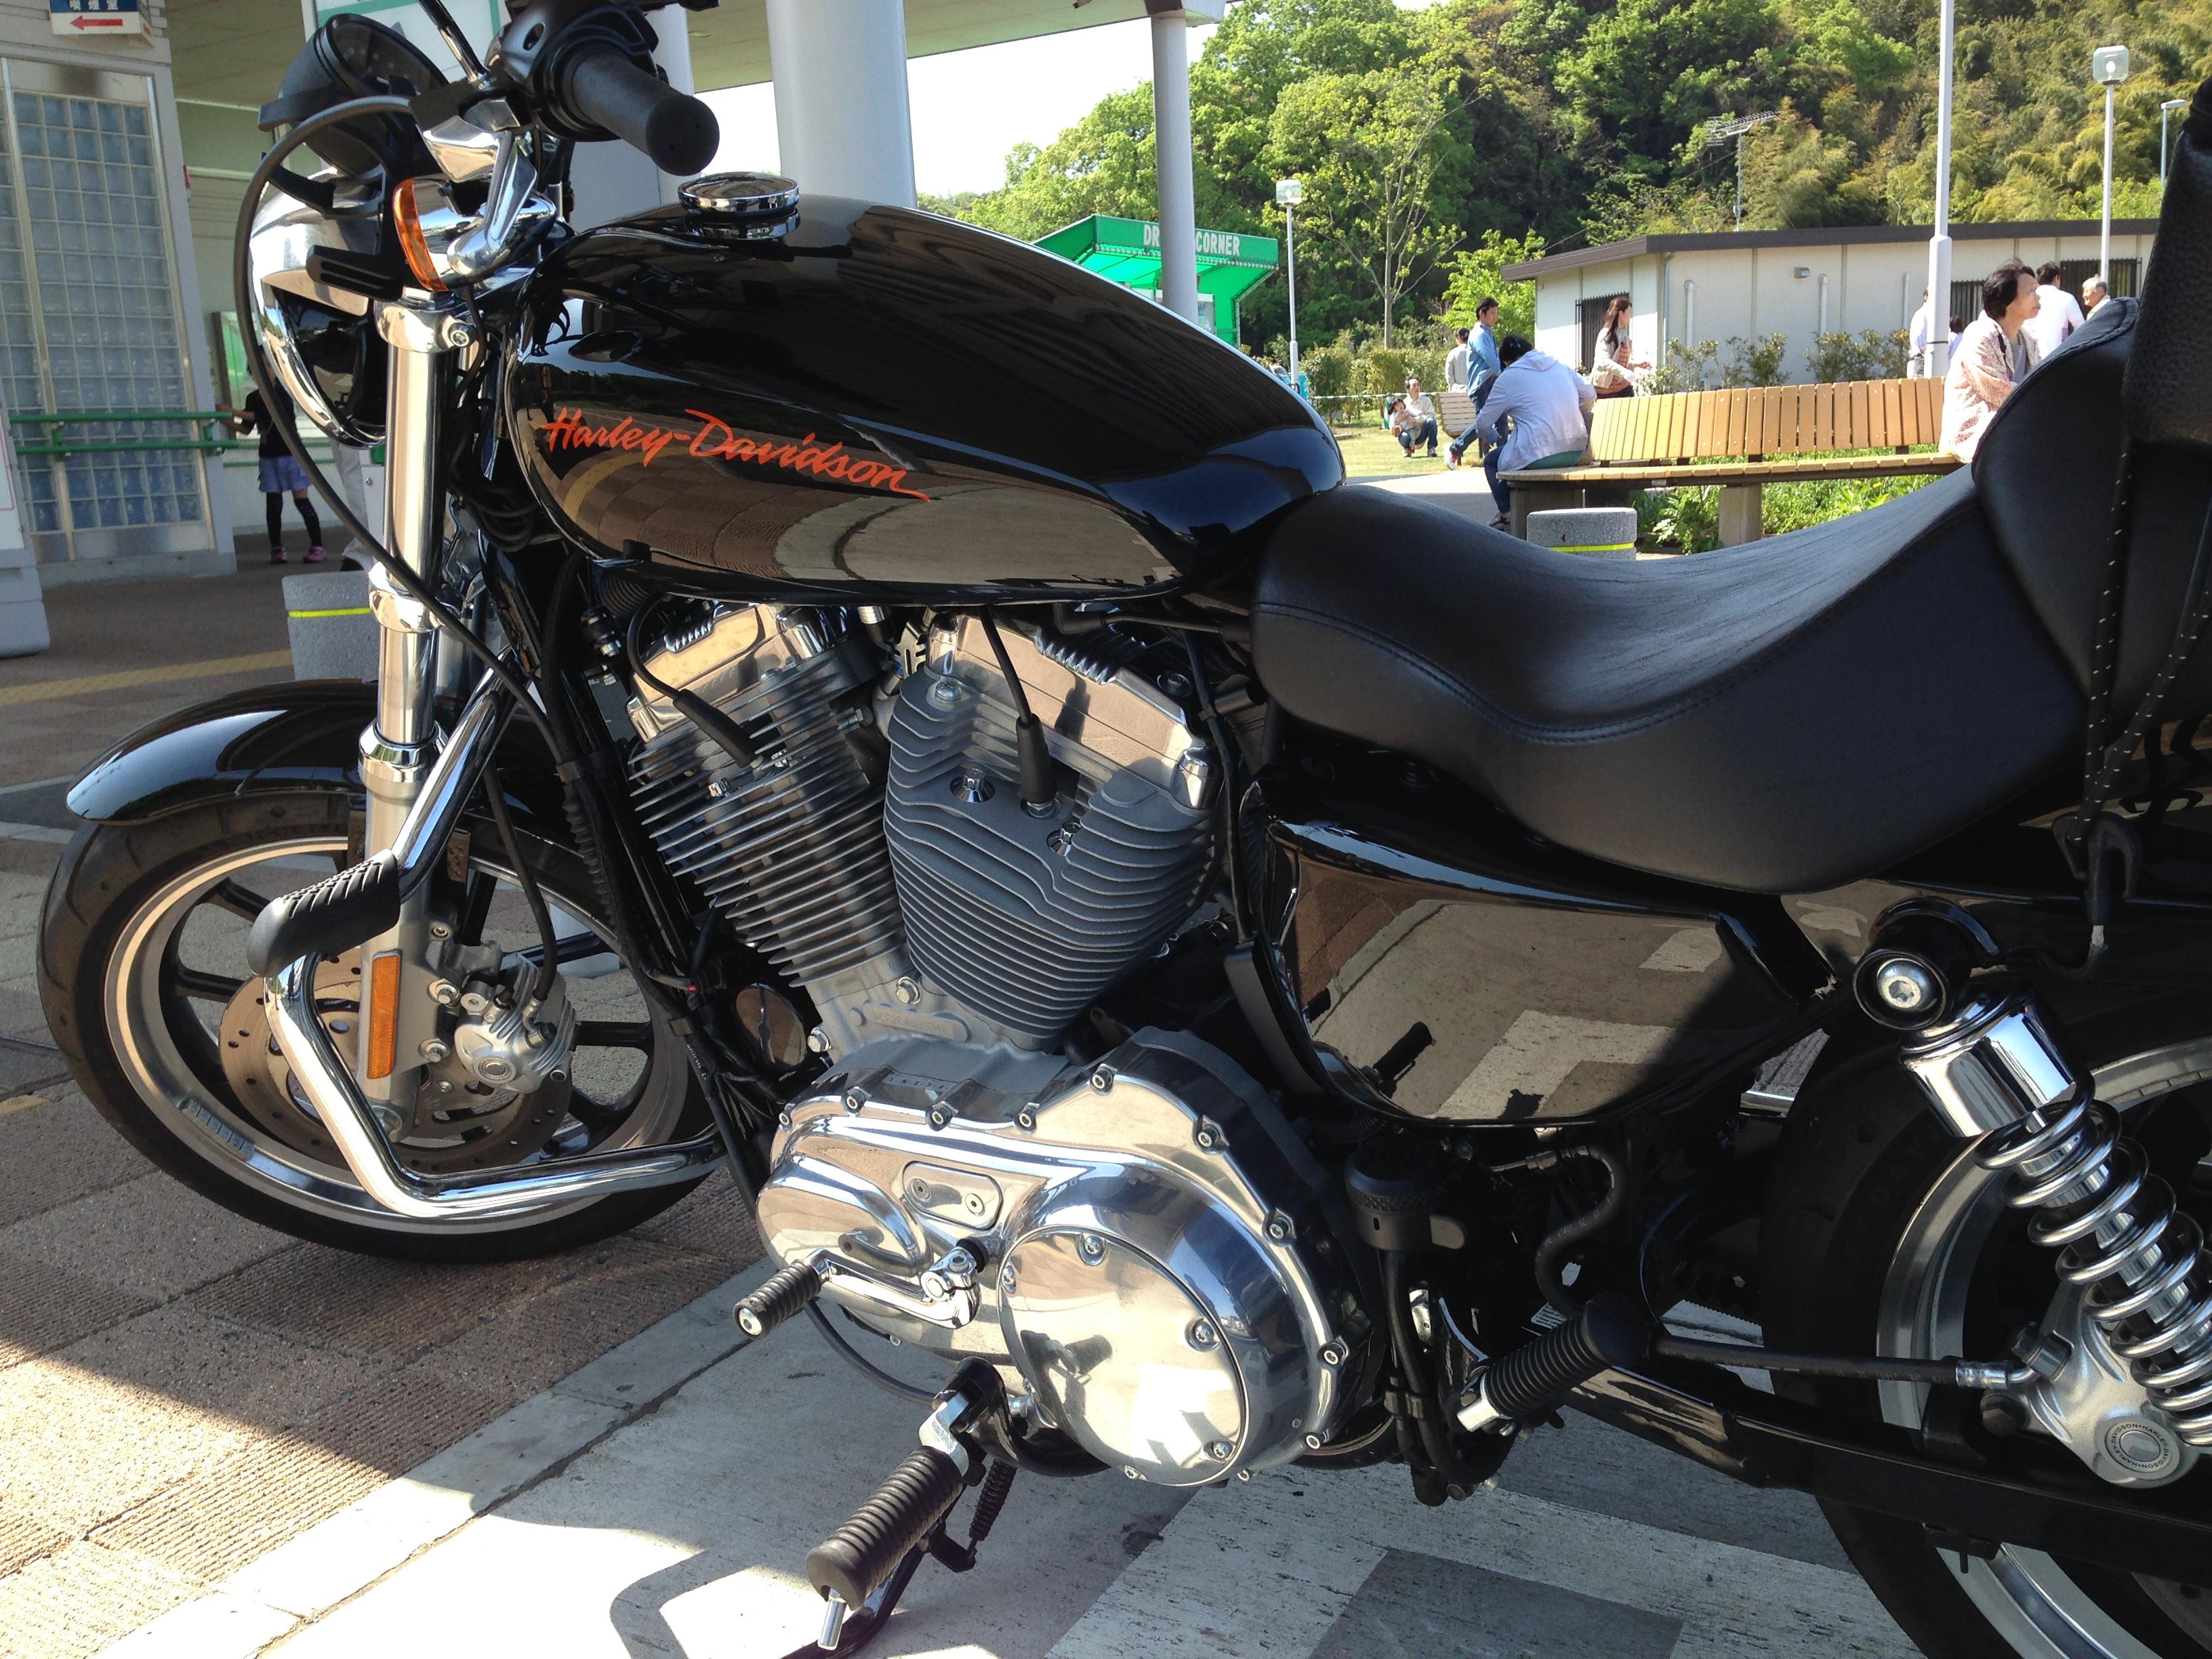 http://blog.corco.jp/corcovado/IMG_9083.JPG